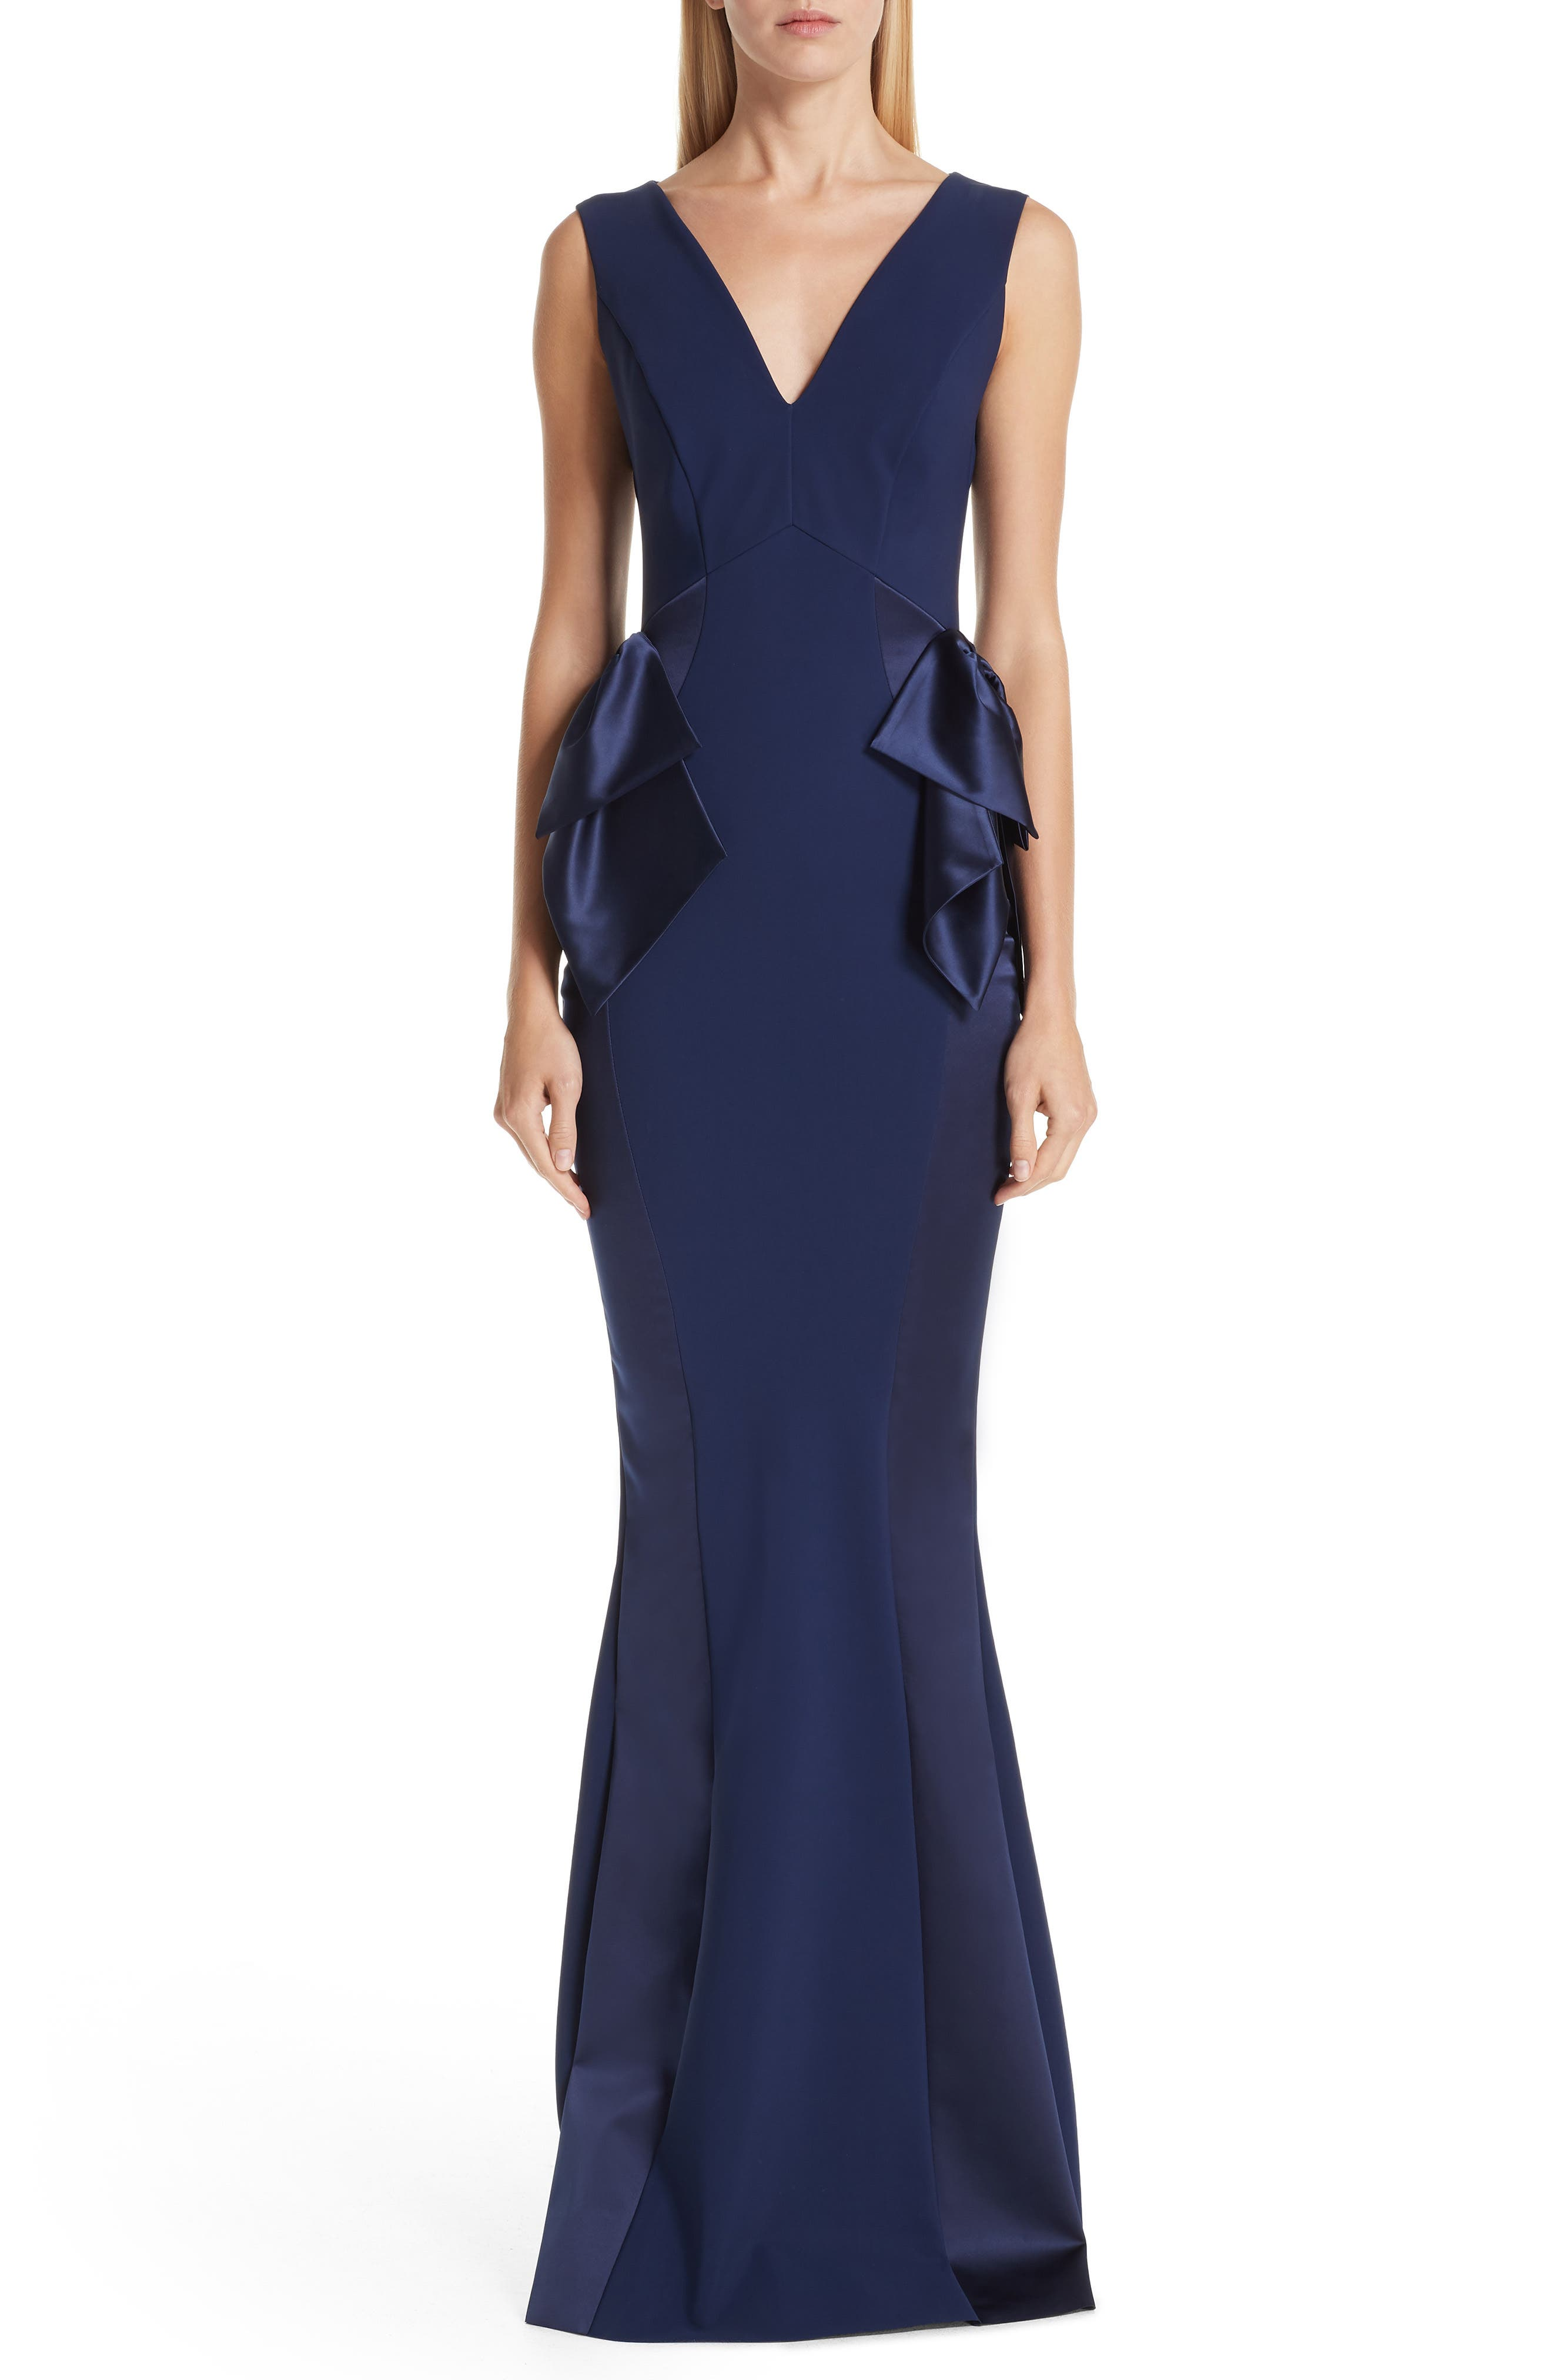 Macaria Satin Bow Trumpet Gown,                             Main thumbnail 1, color,                             BLUE NOTTE